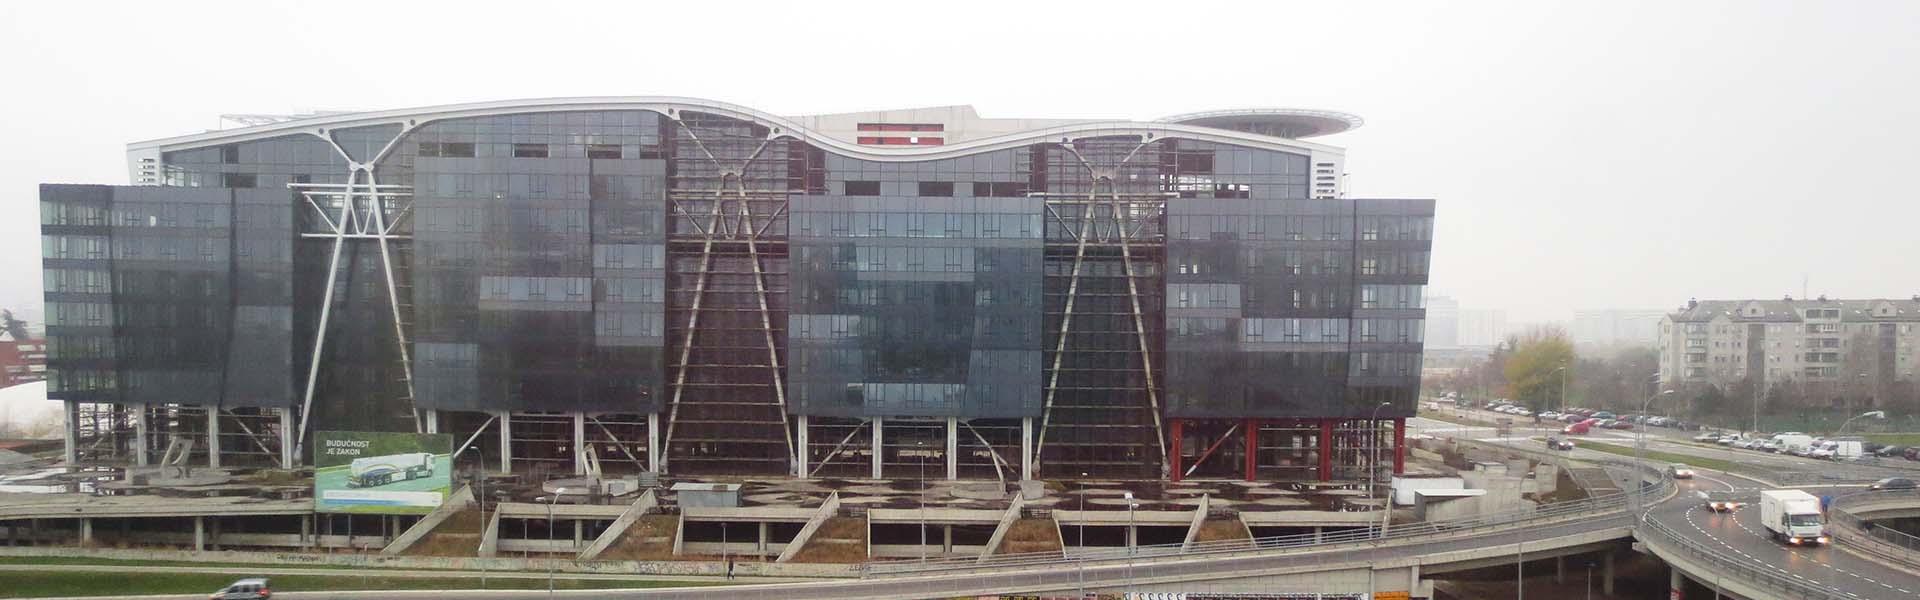 Dostava hrane Expo centar (blok 41) | Beograd